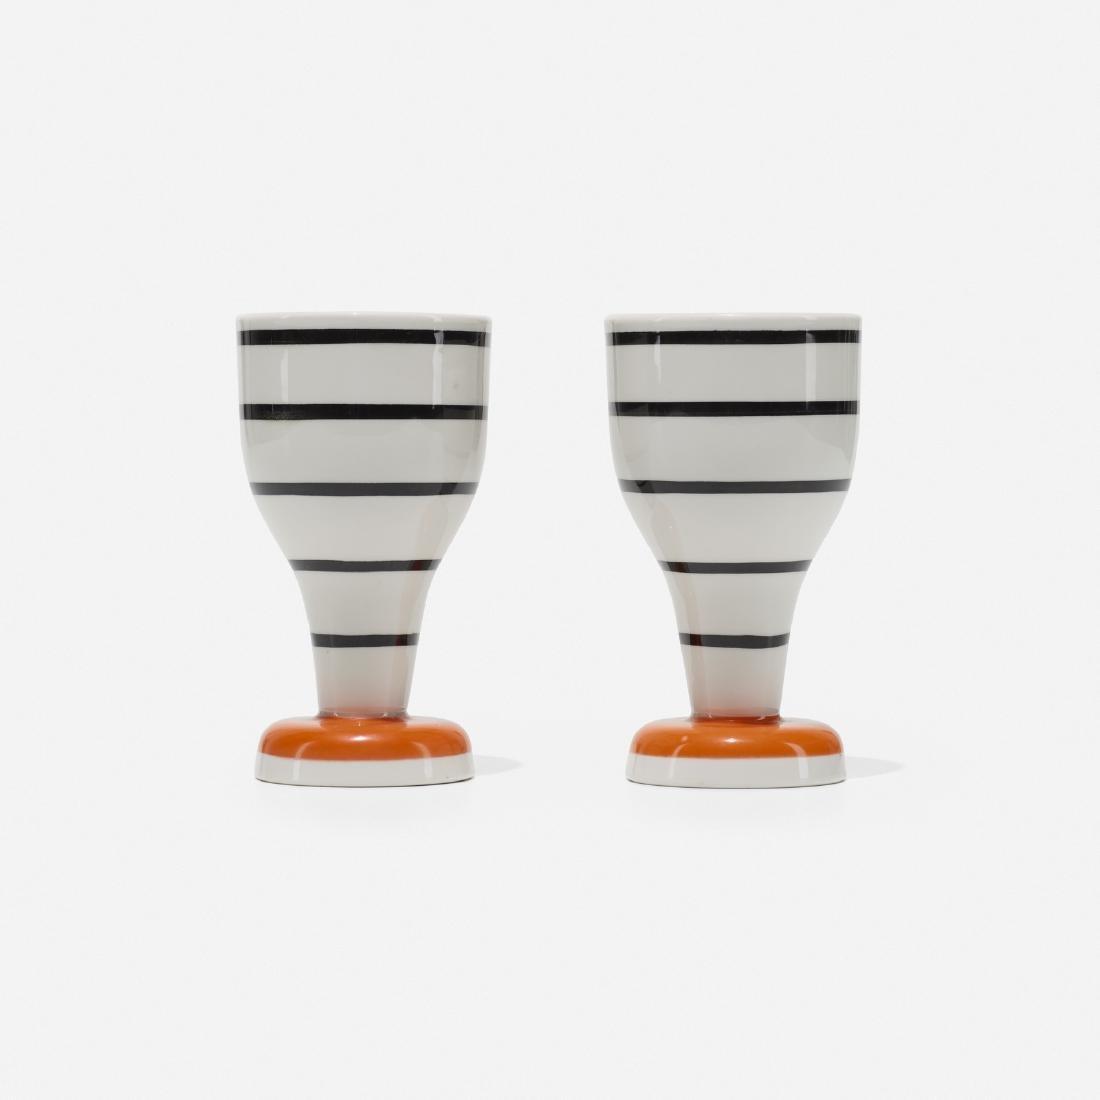 Alexander Girard, cups from La Fonda del Sol, pair